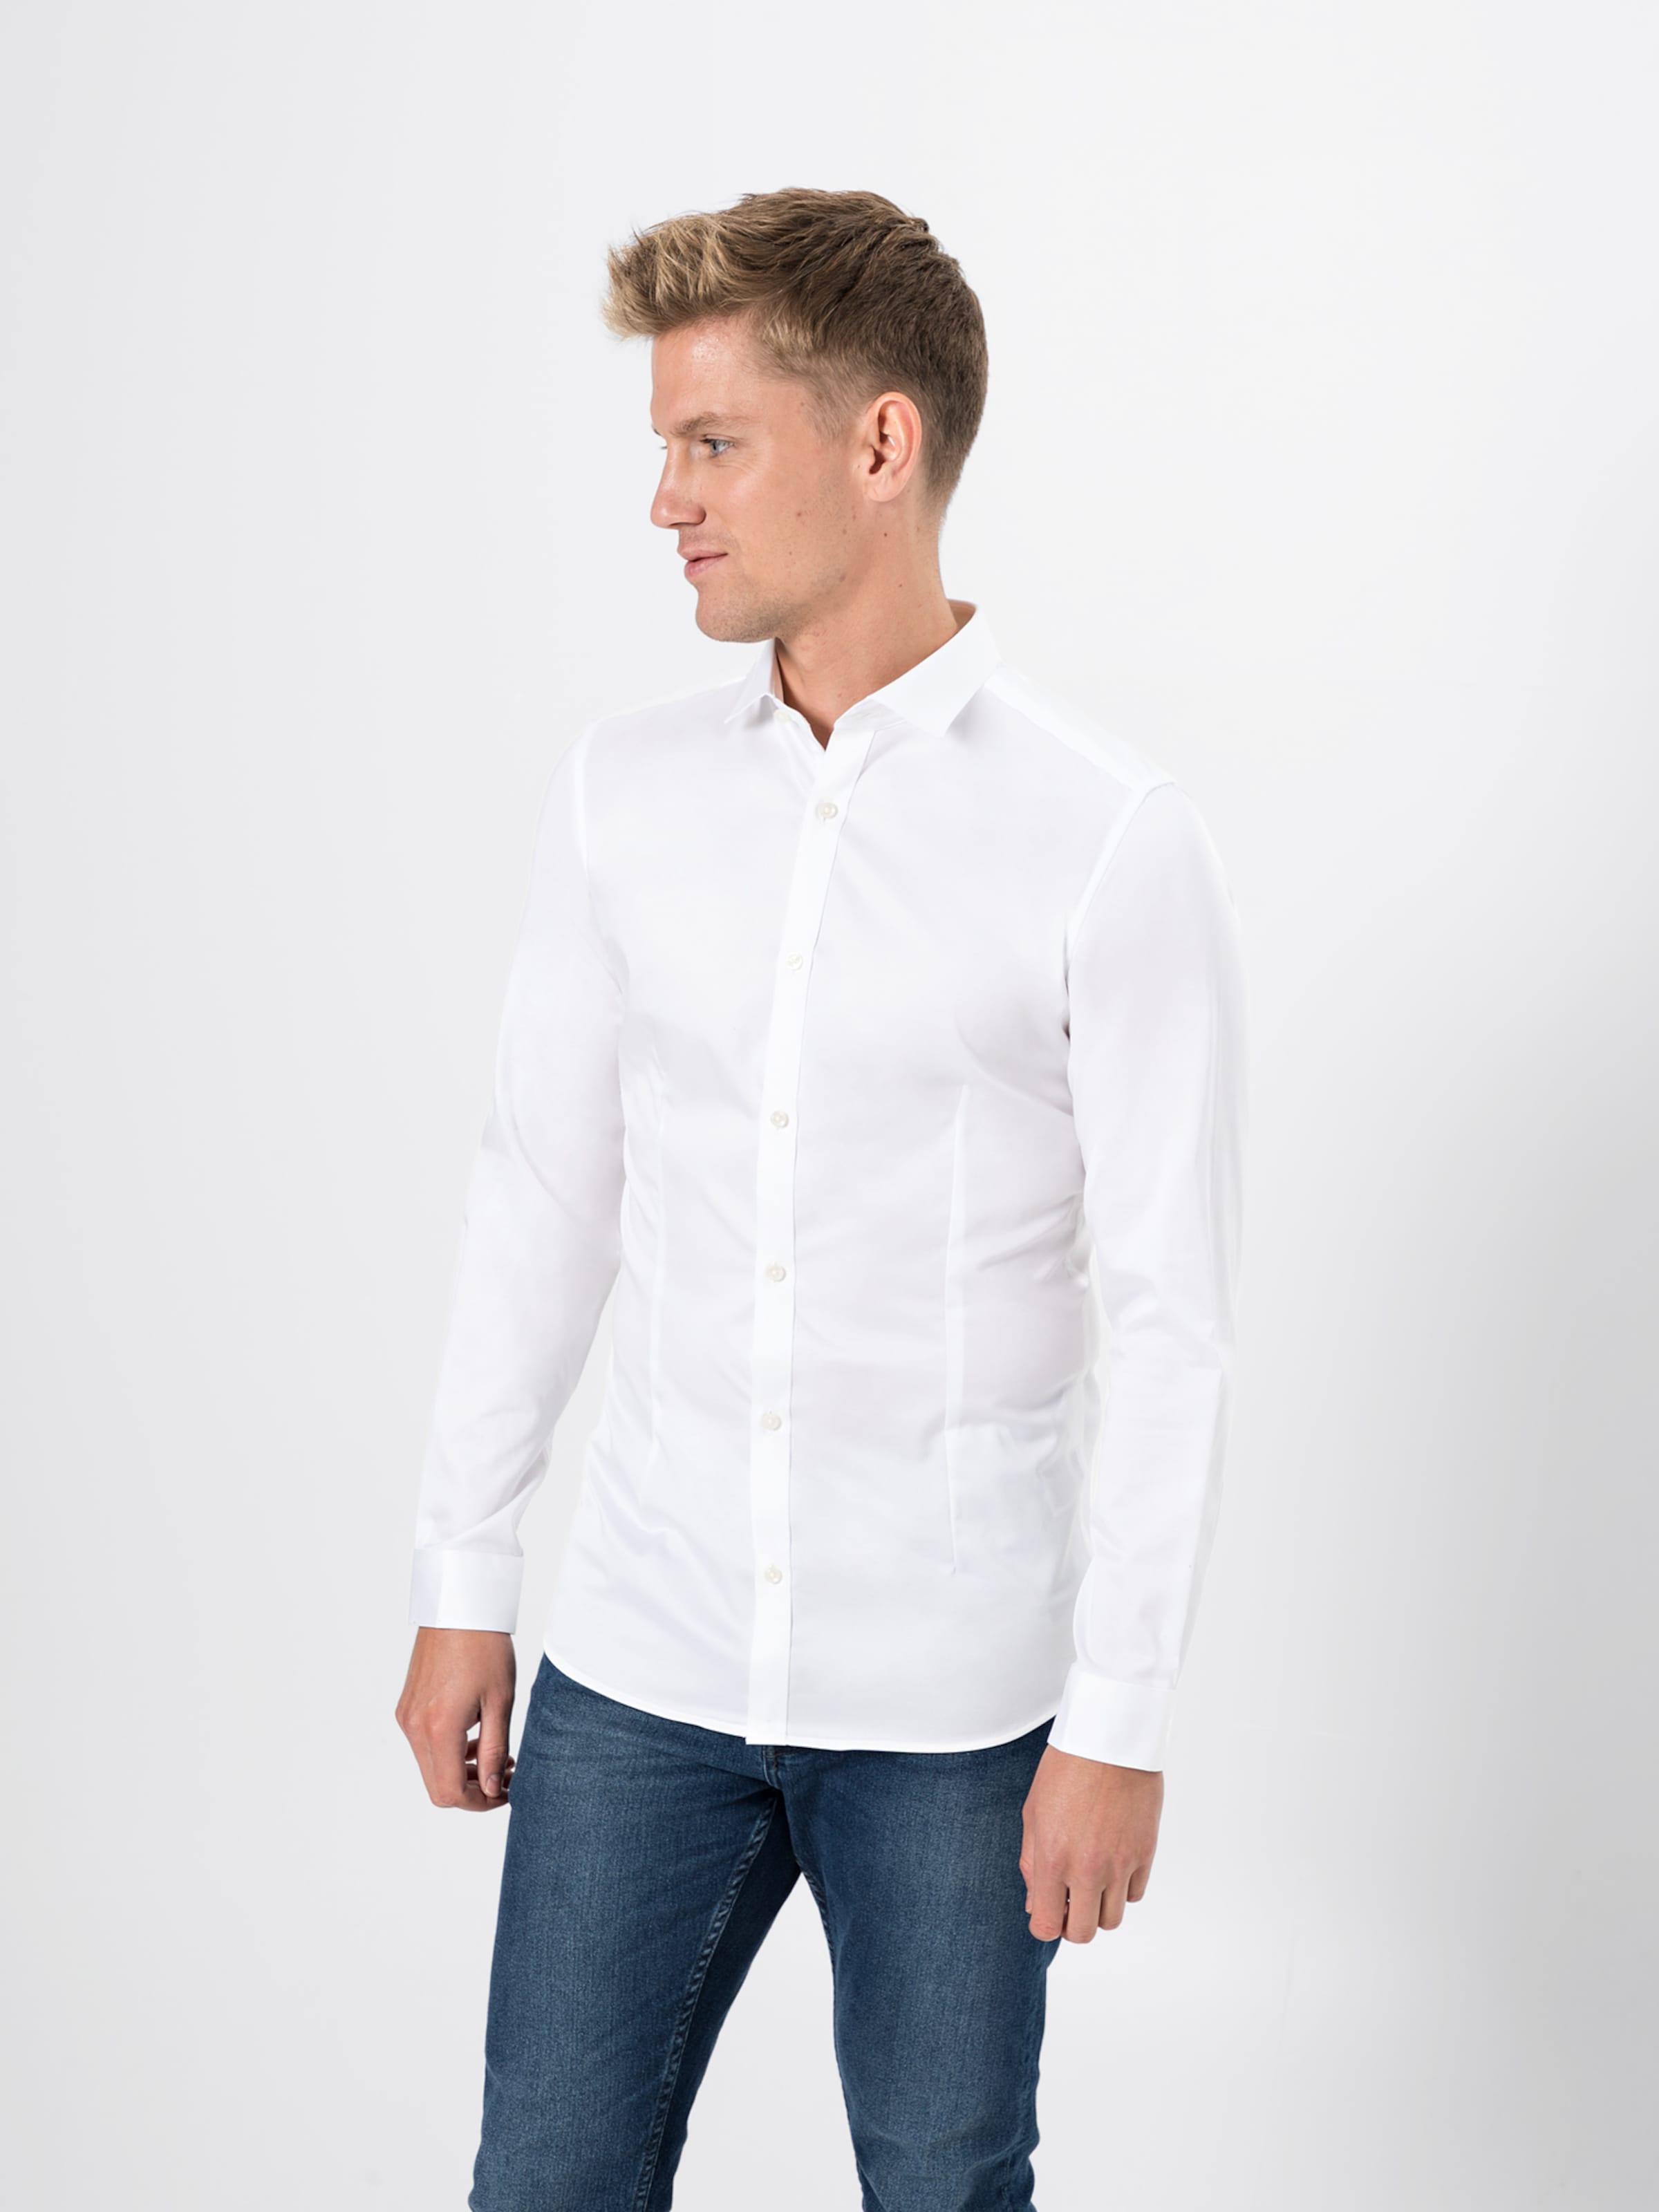 'jjprparma Jackamp; s Blanc Noos' En Shirt Jones Chemise L BoreCWdx